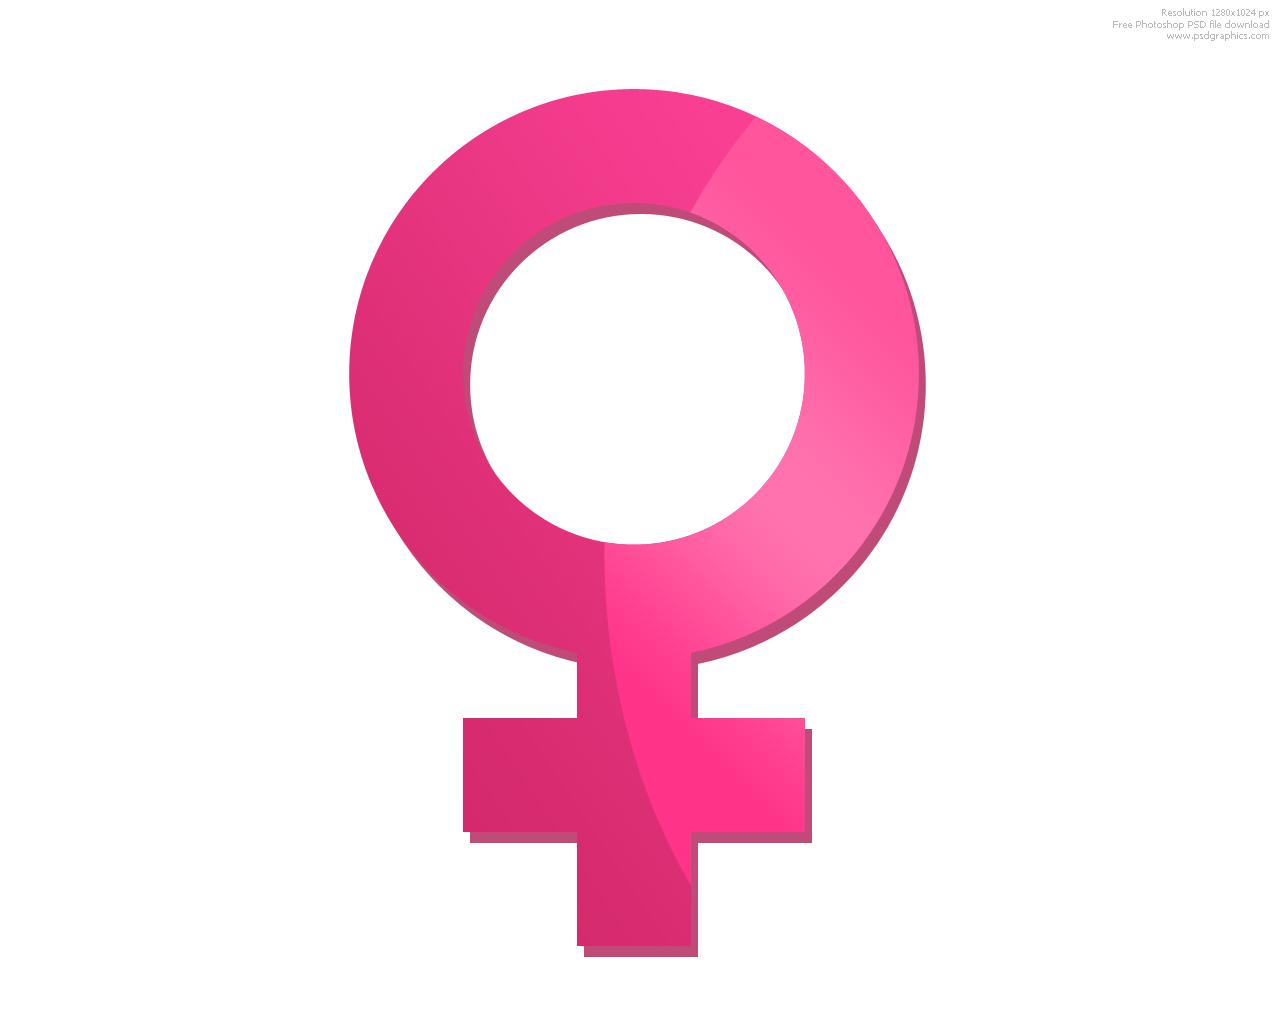 Female clipart female gender. Free symbol download clip